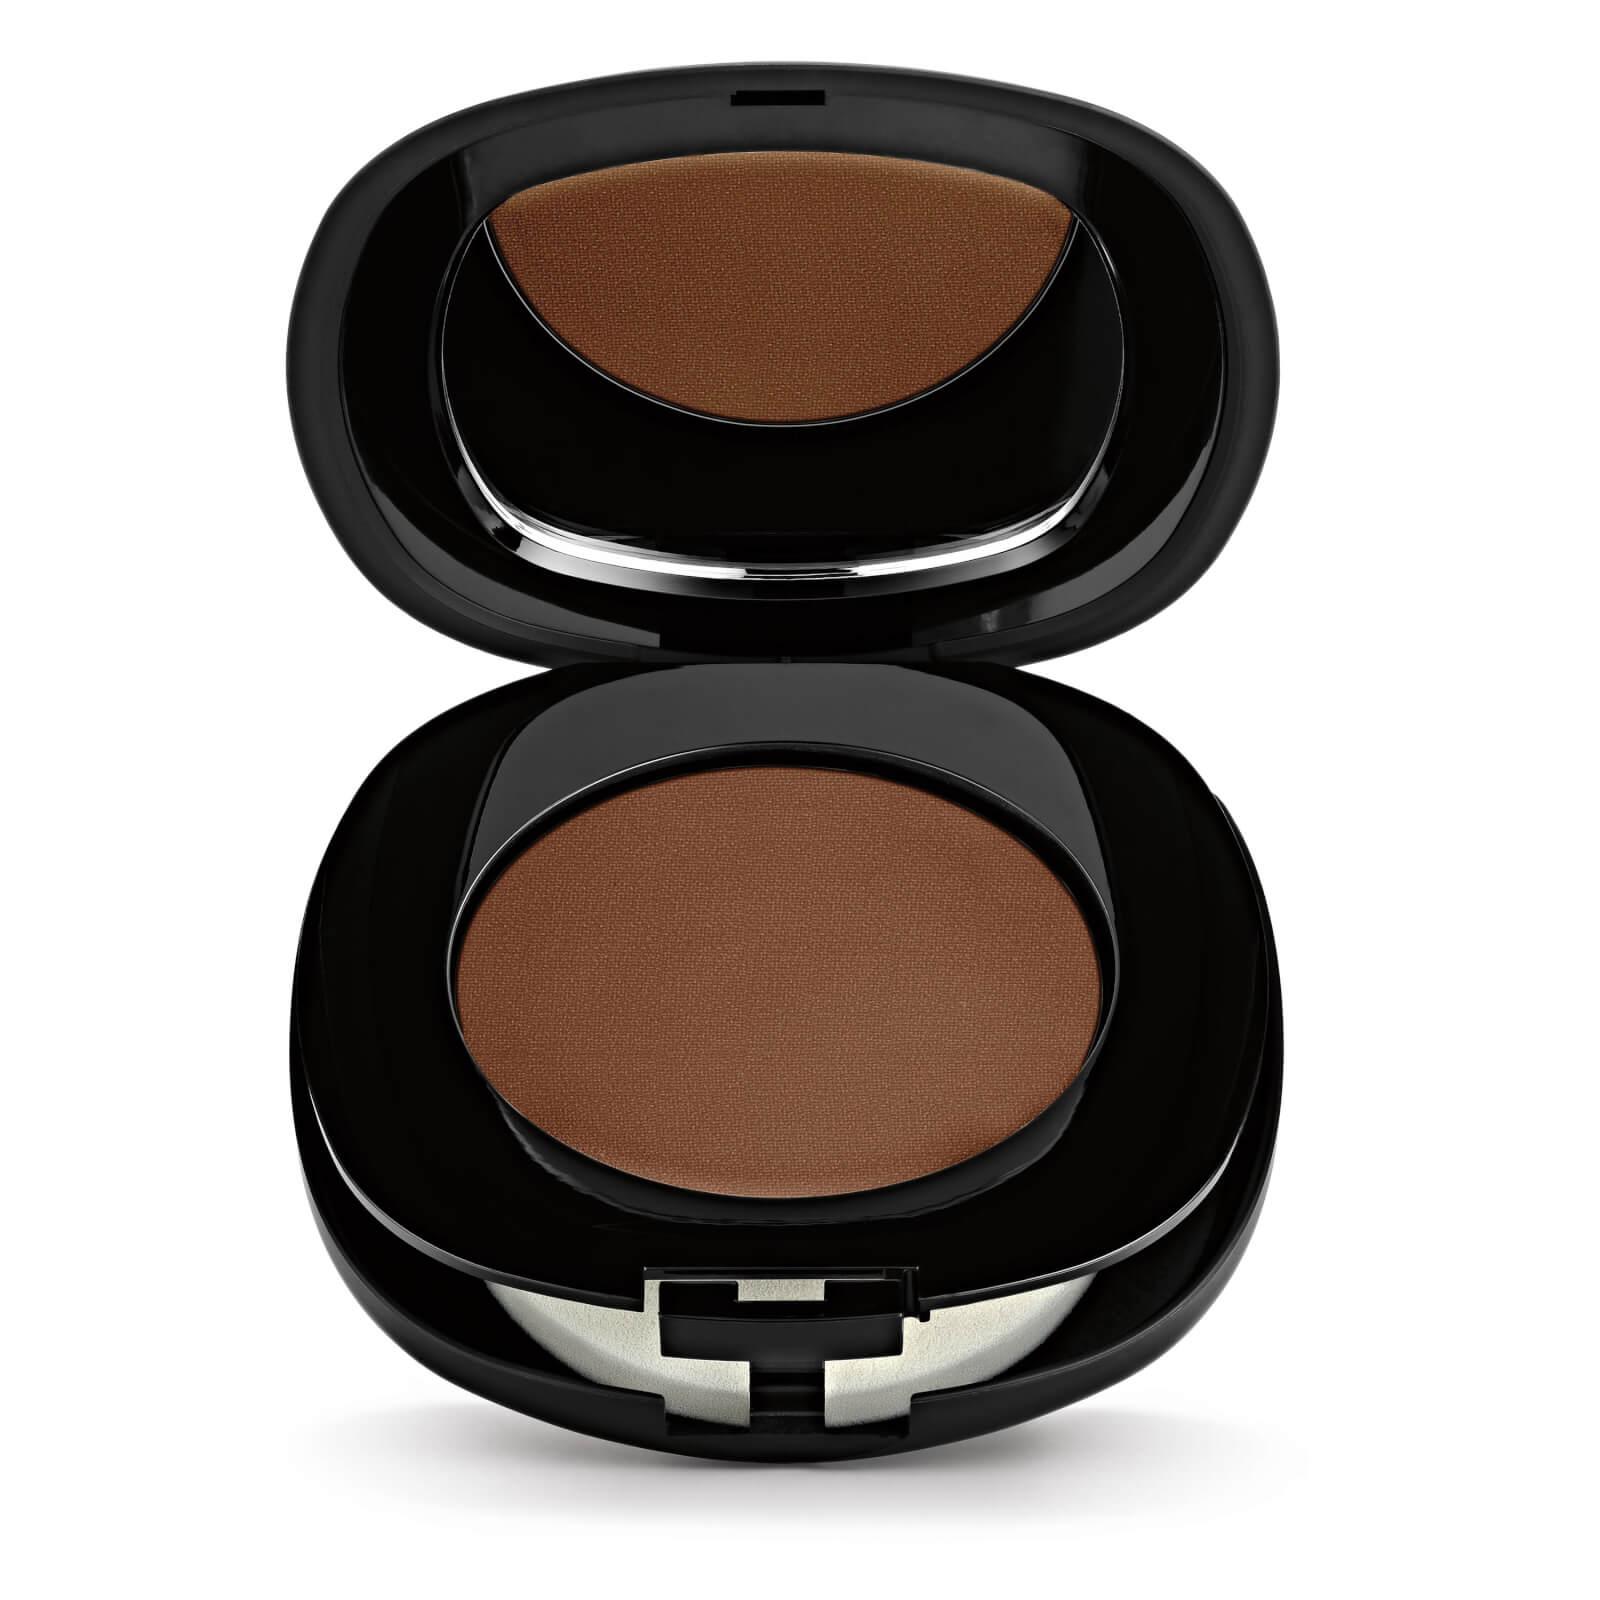 Elizabeth Arden Flawless Finish Everyday Perfection Bouncy Makeup 10g (Various Shades) - Hazelnut 14